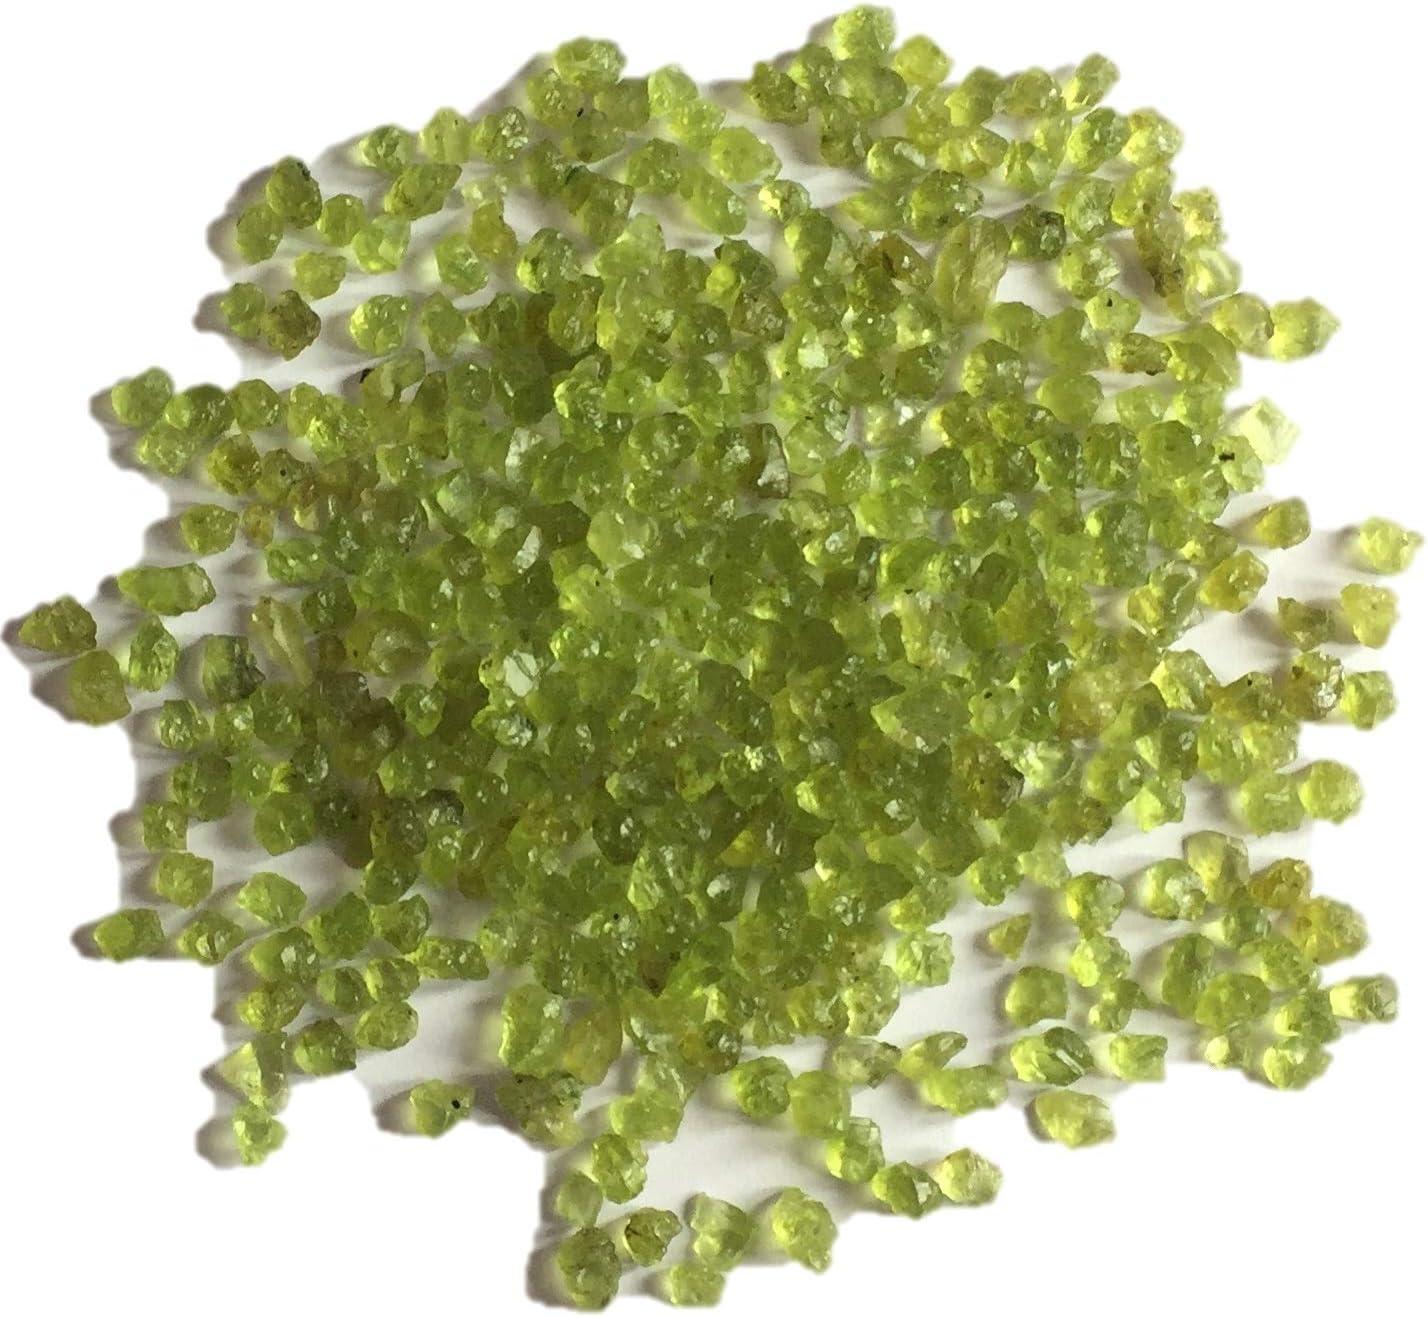 Fashion ShreeCrystalsBeads : 4 lb Max 79% OFF Peridot Tumbled Small Chips St Crushed